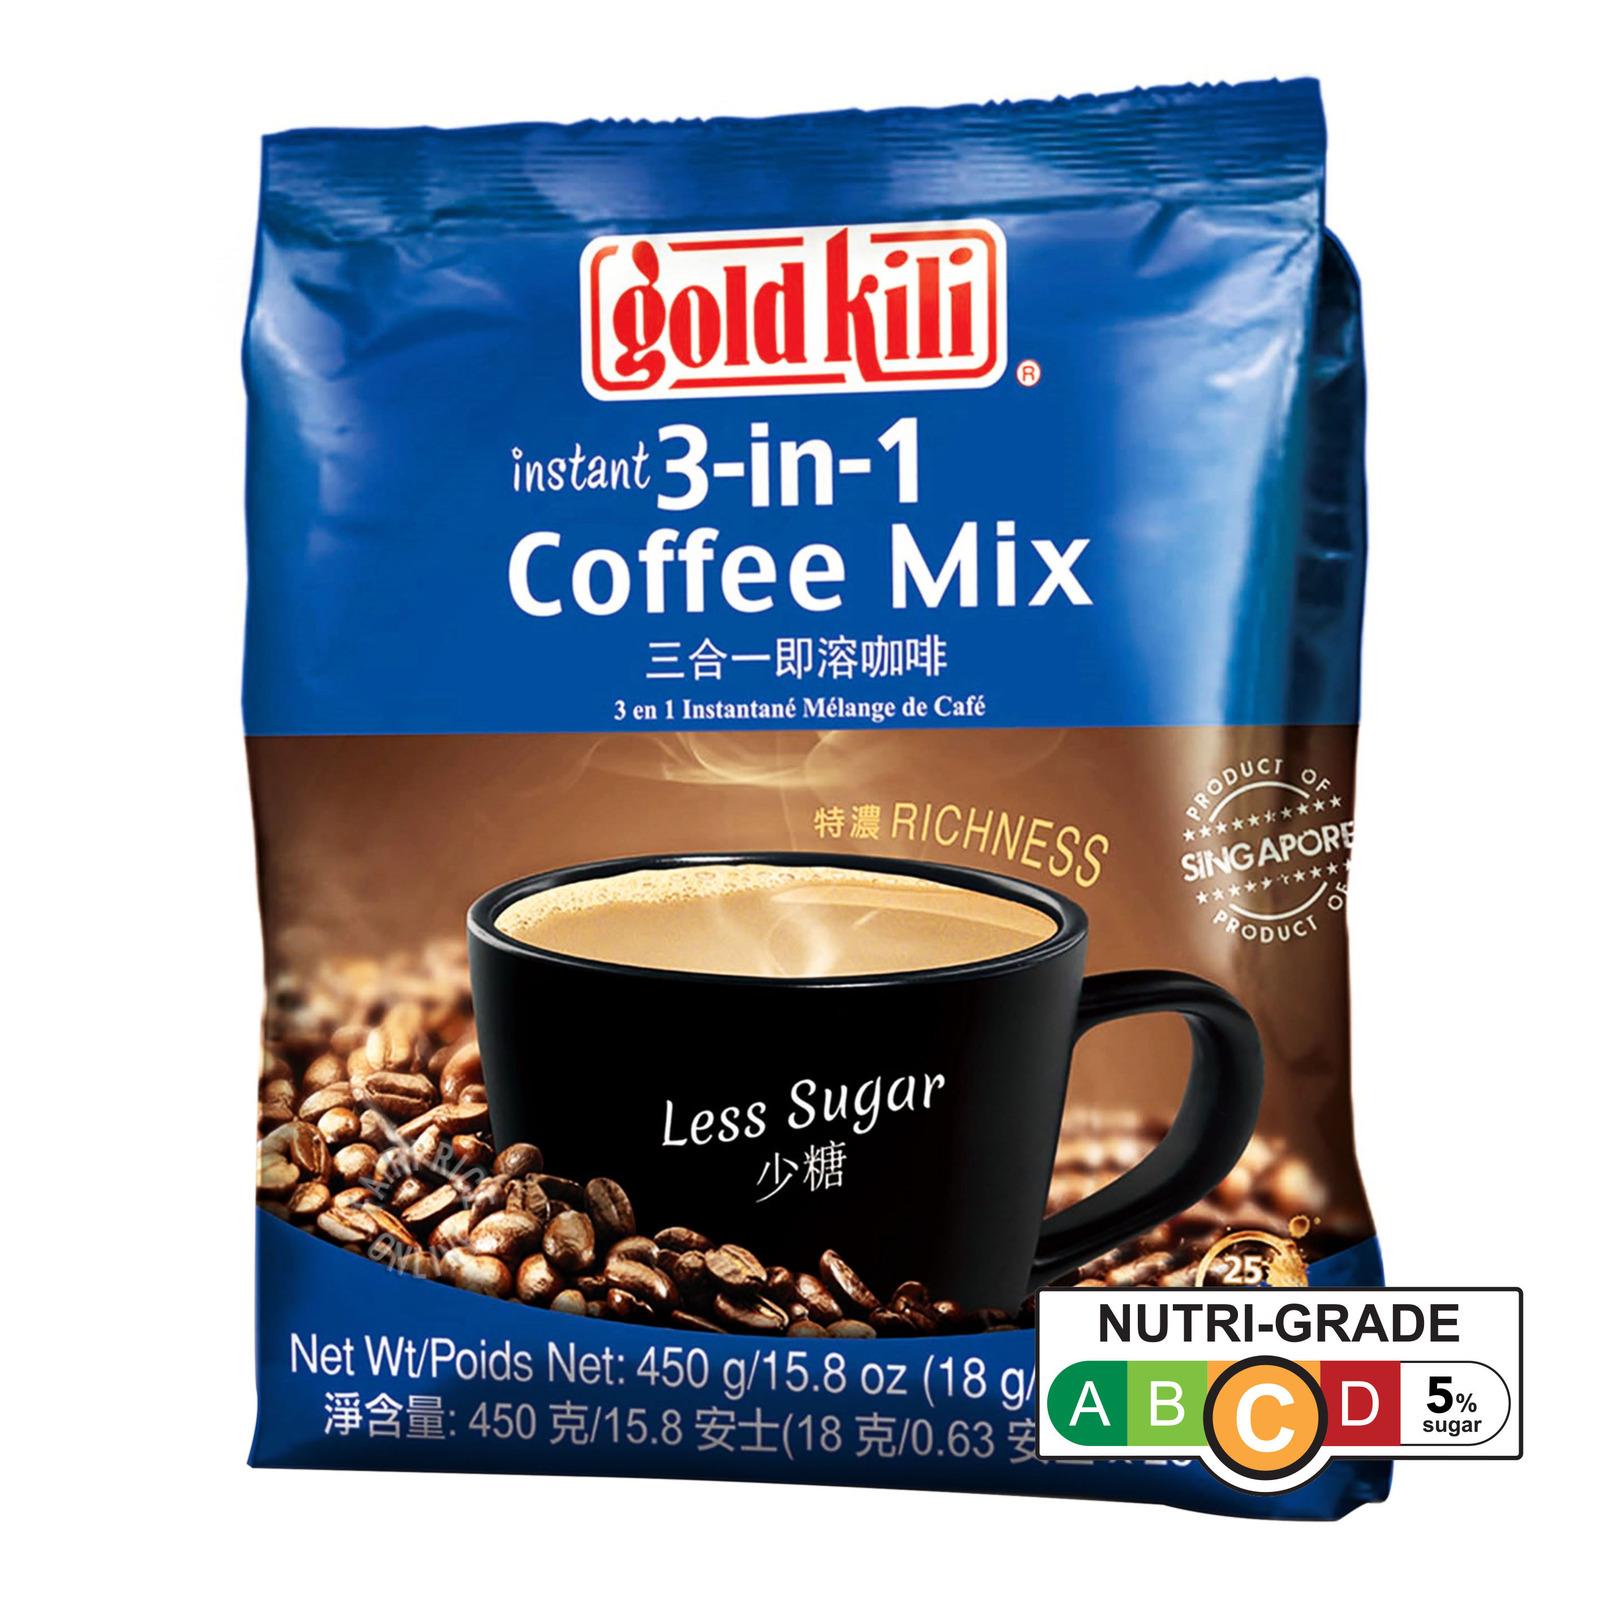 Gold Kili 3 In 1 Instant Coffee - Less Sugar